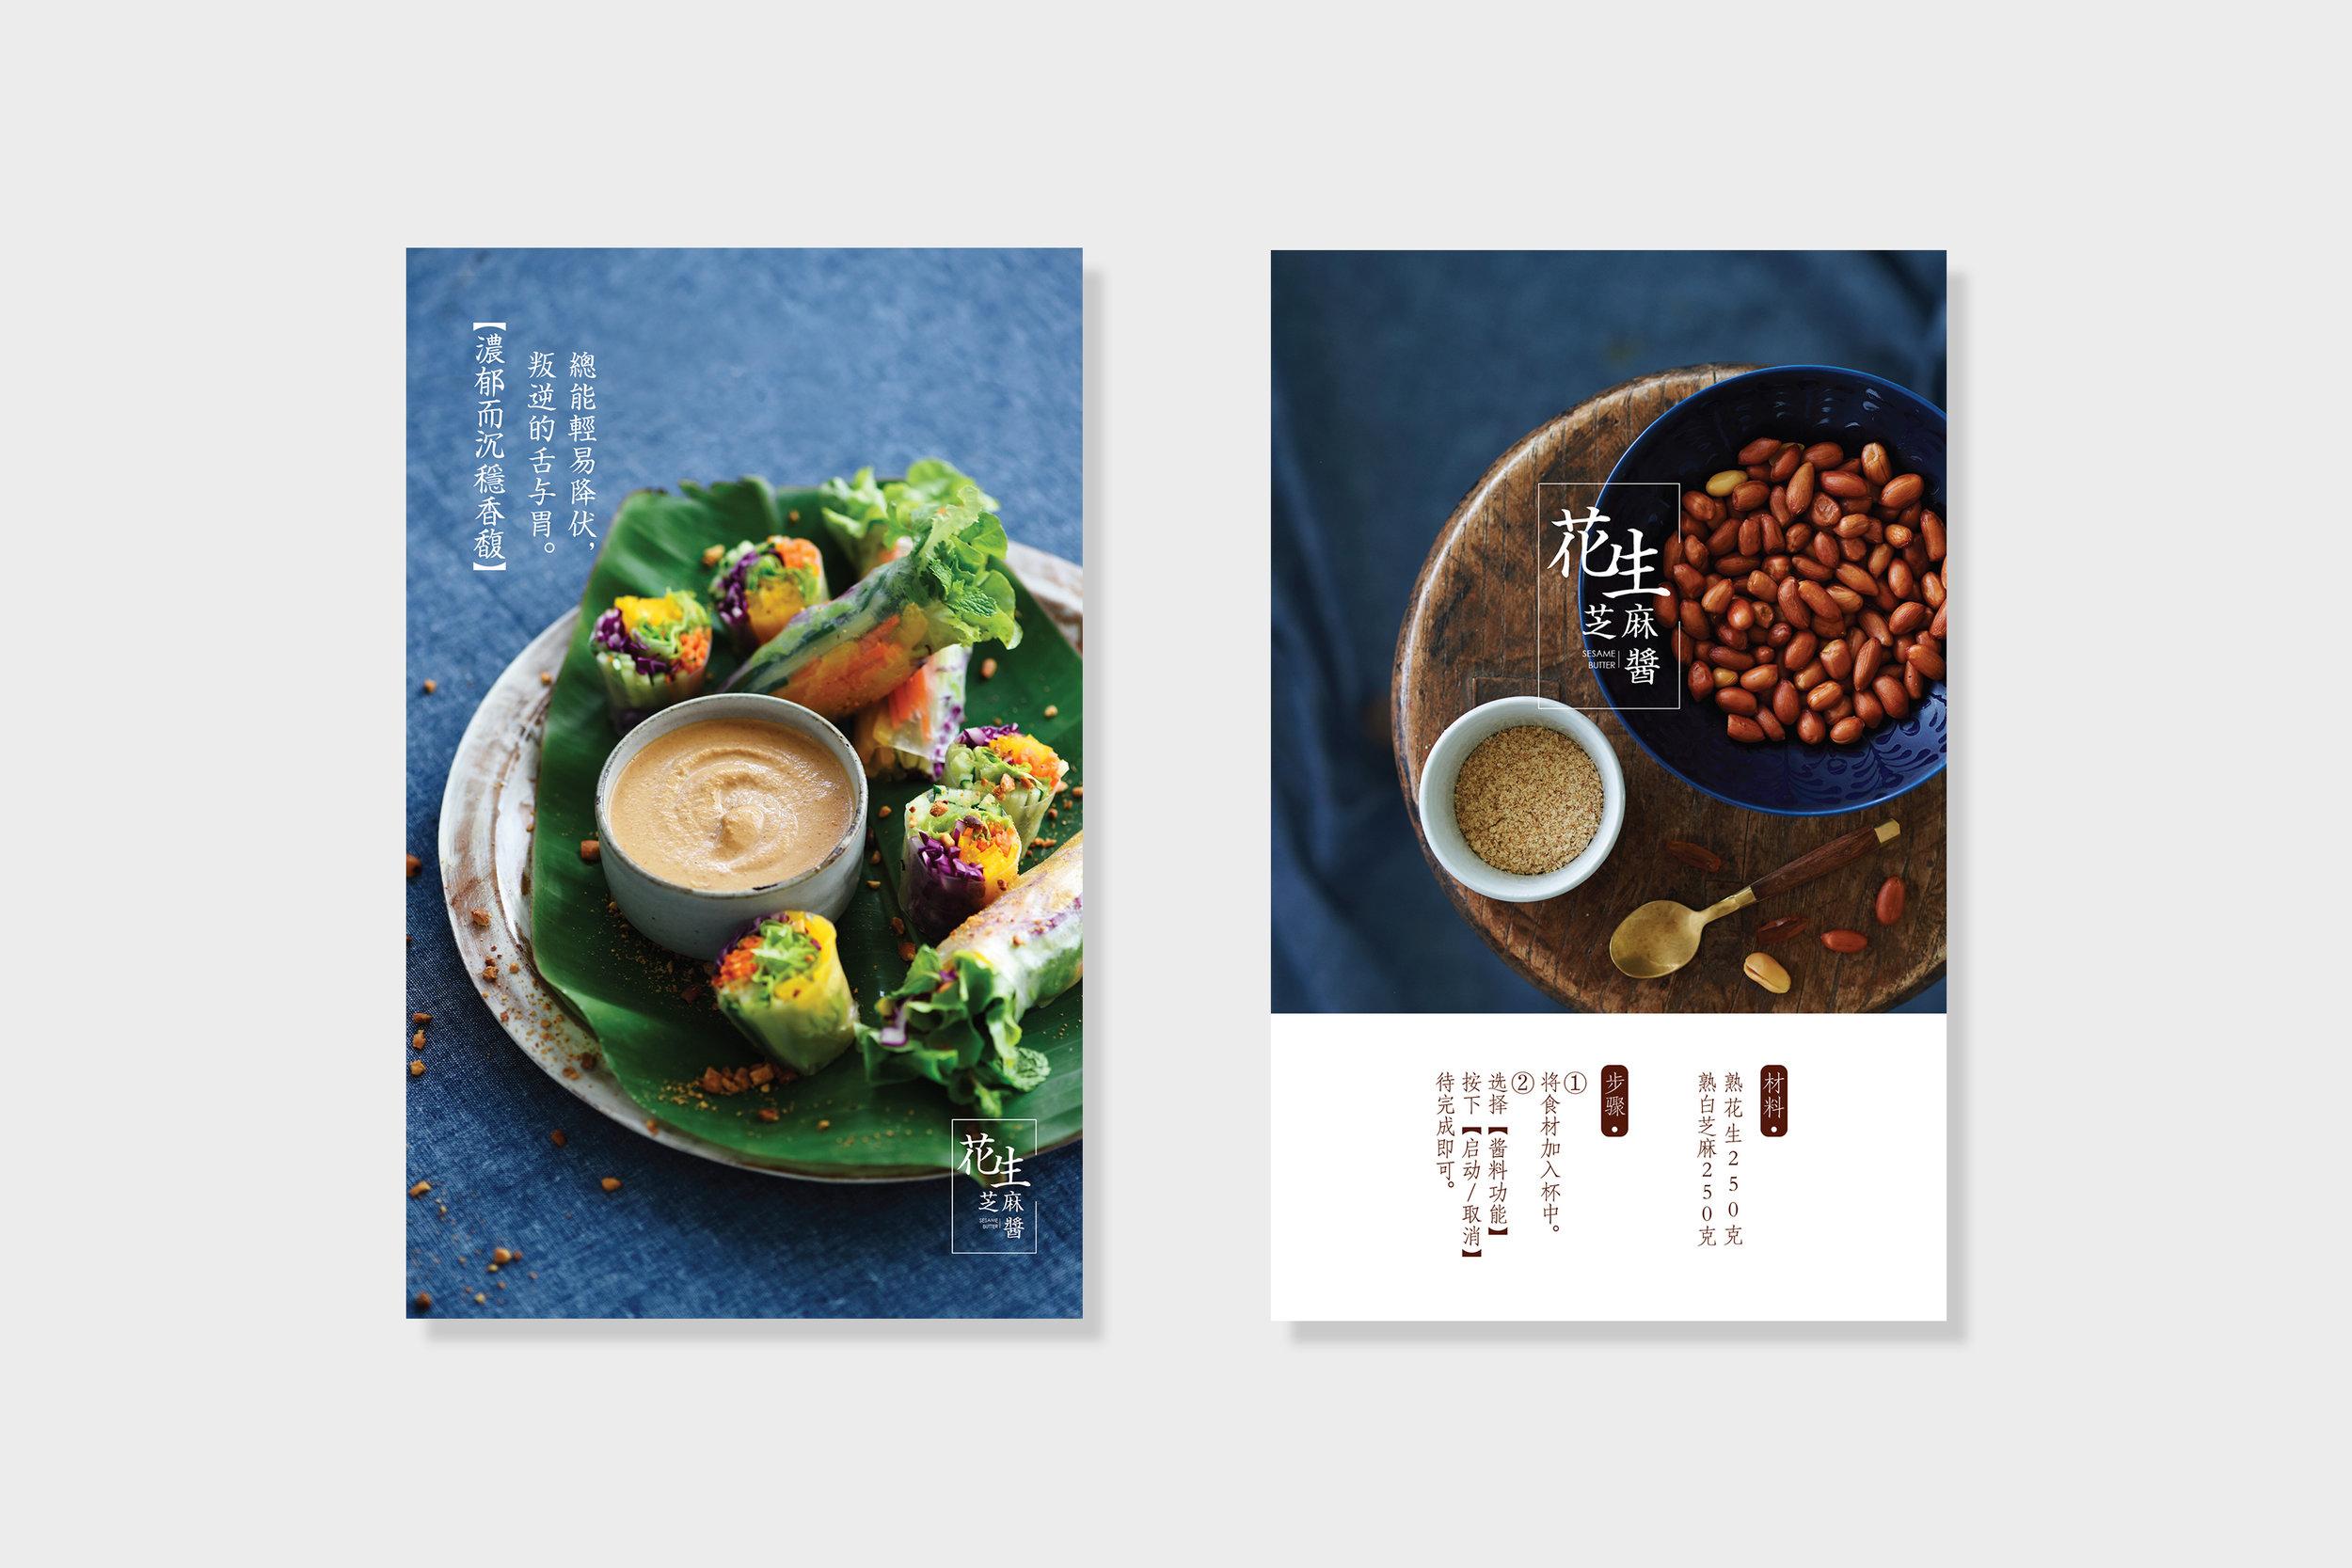 recipe card superimpose.jpg